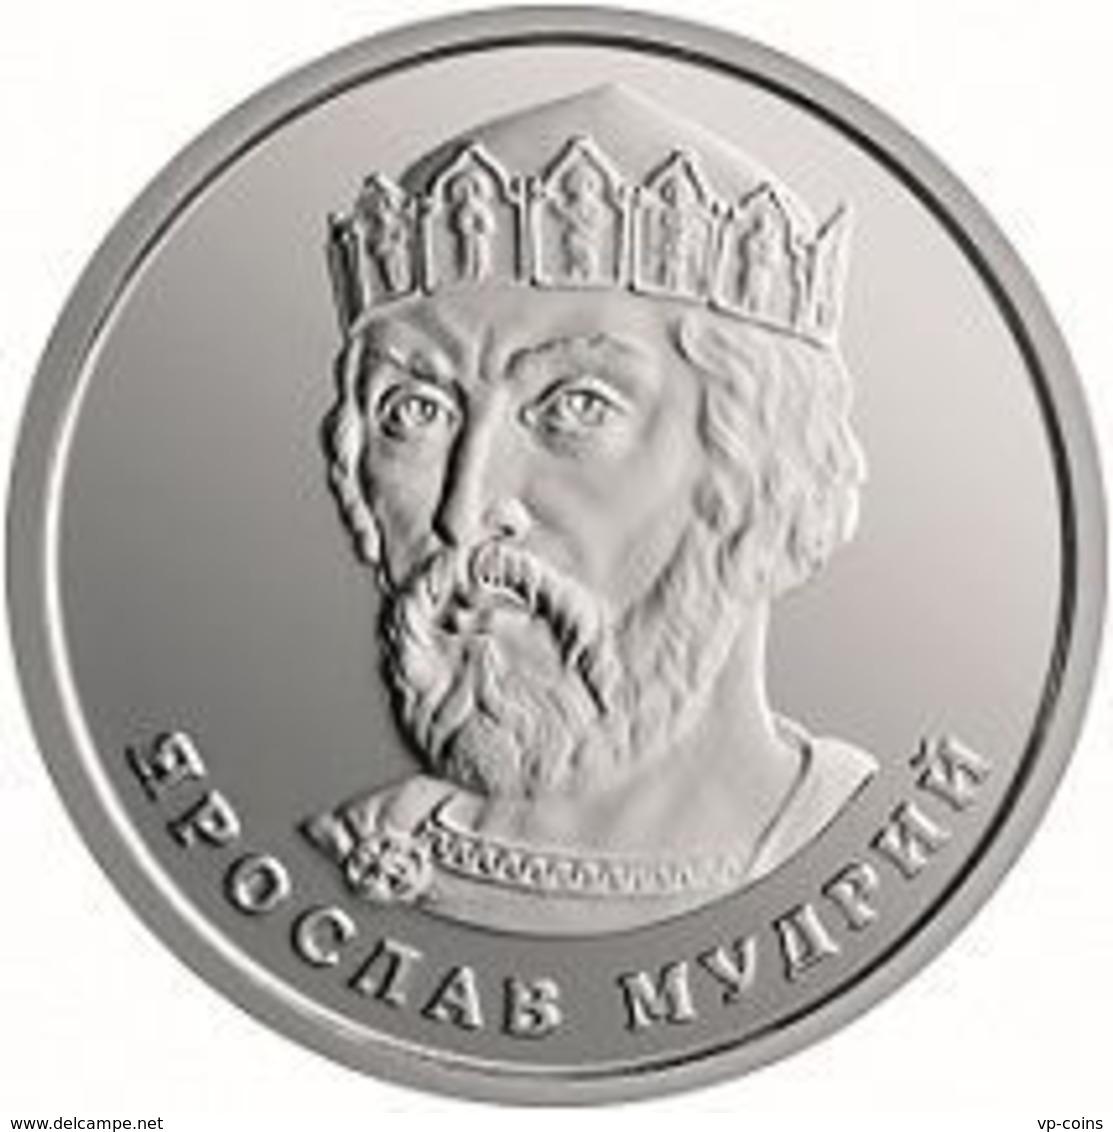 Ukraine. Coin. 2 Hryvnia. 2018. UNC. Prince Yaroslav The Wise - Ukraine